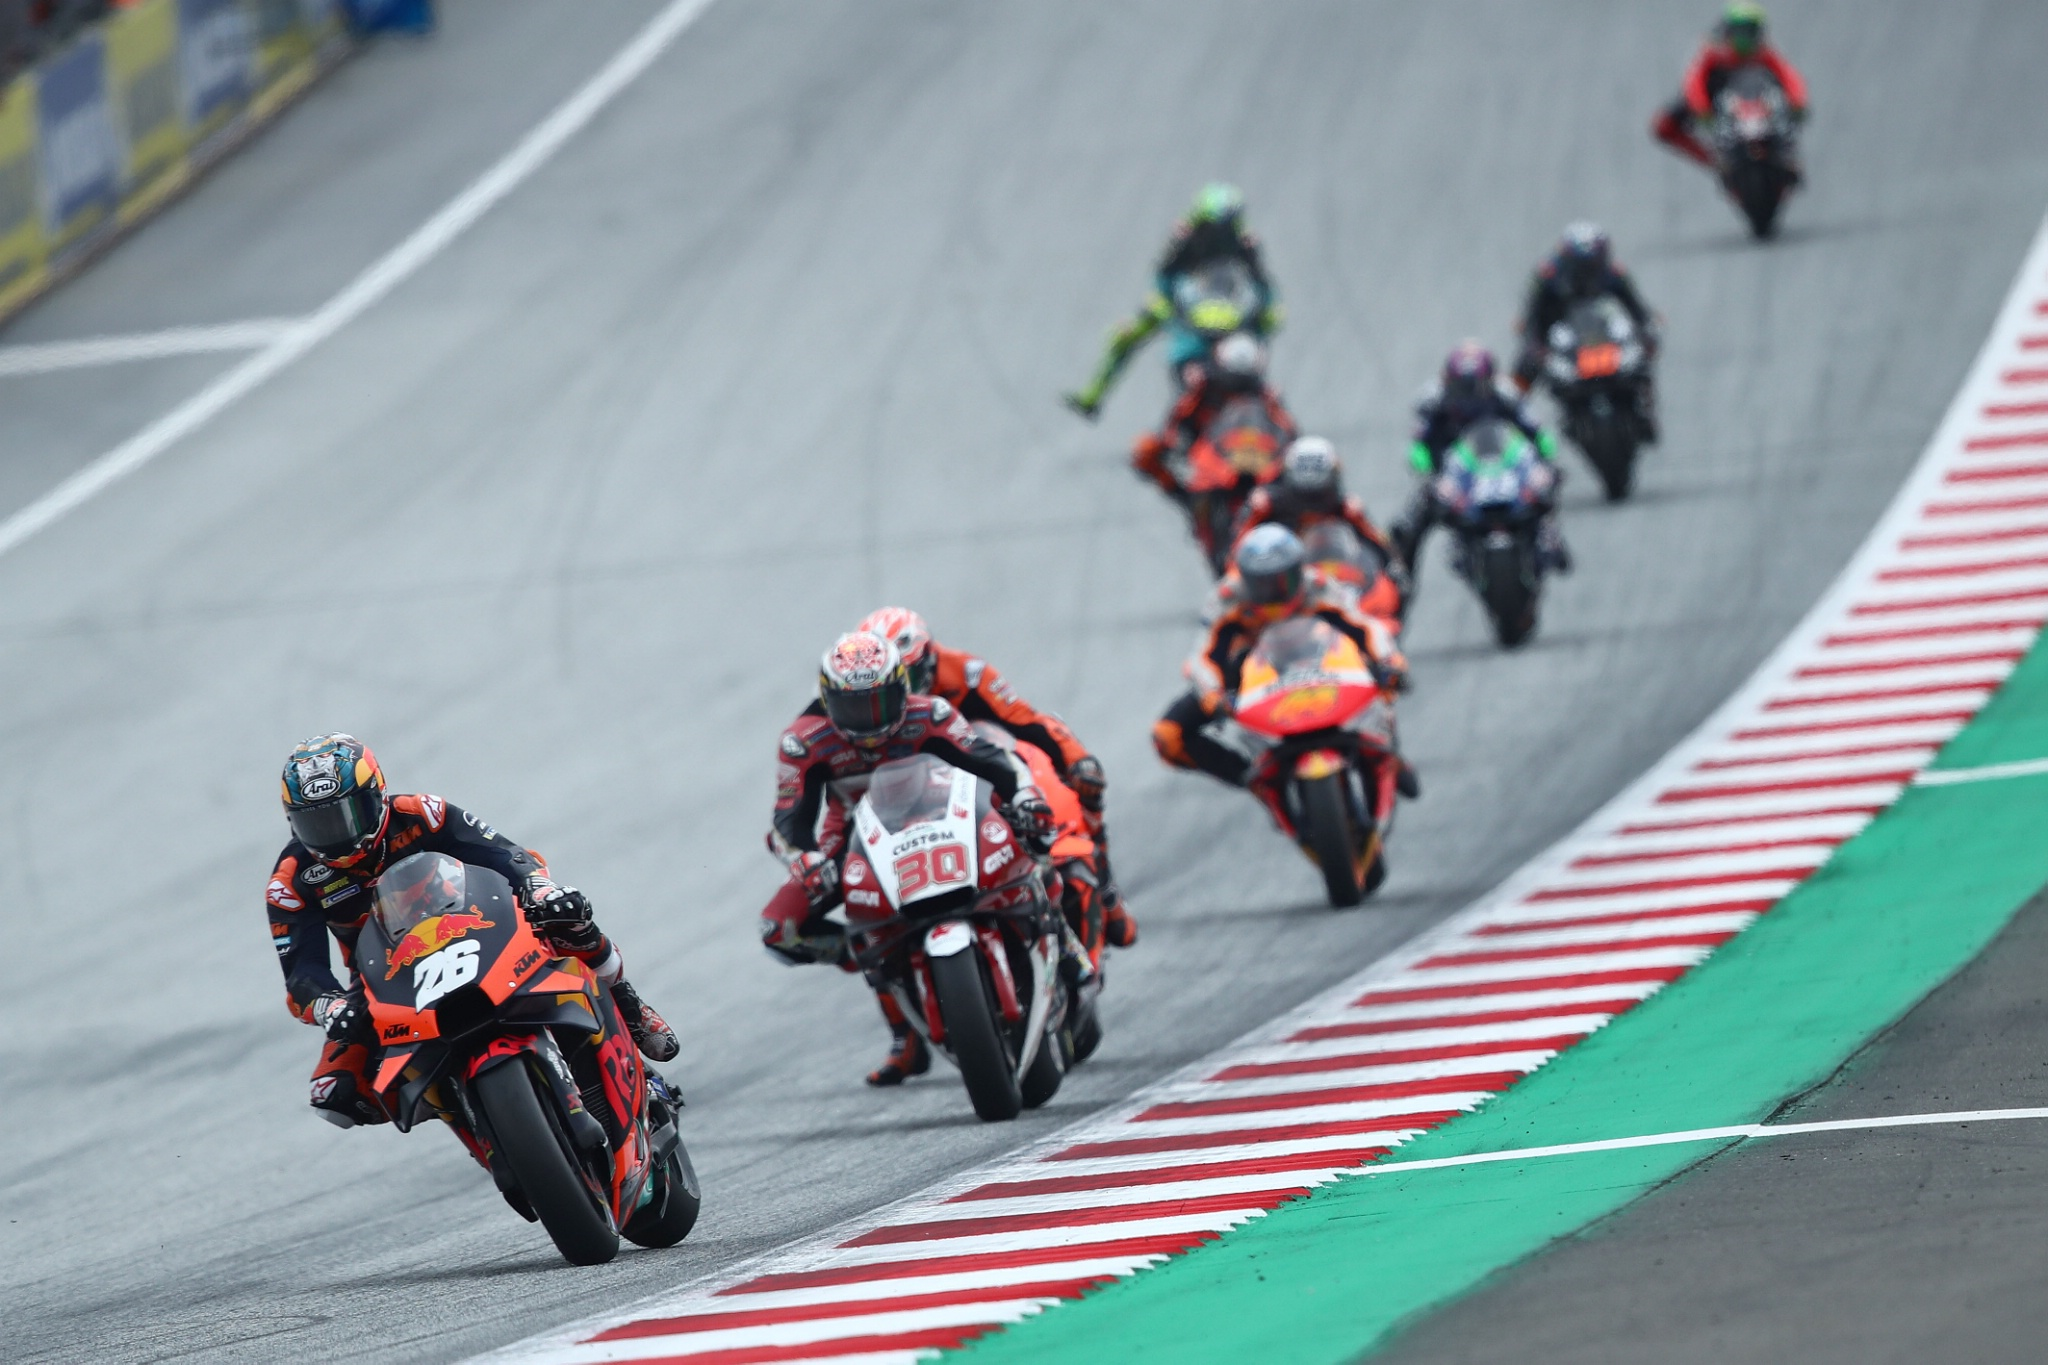 Dani Pedrosa MotoGP race, Styria MotoGP, 8 August 2021